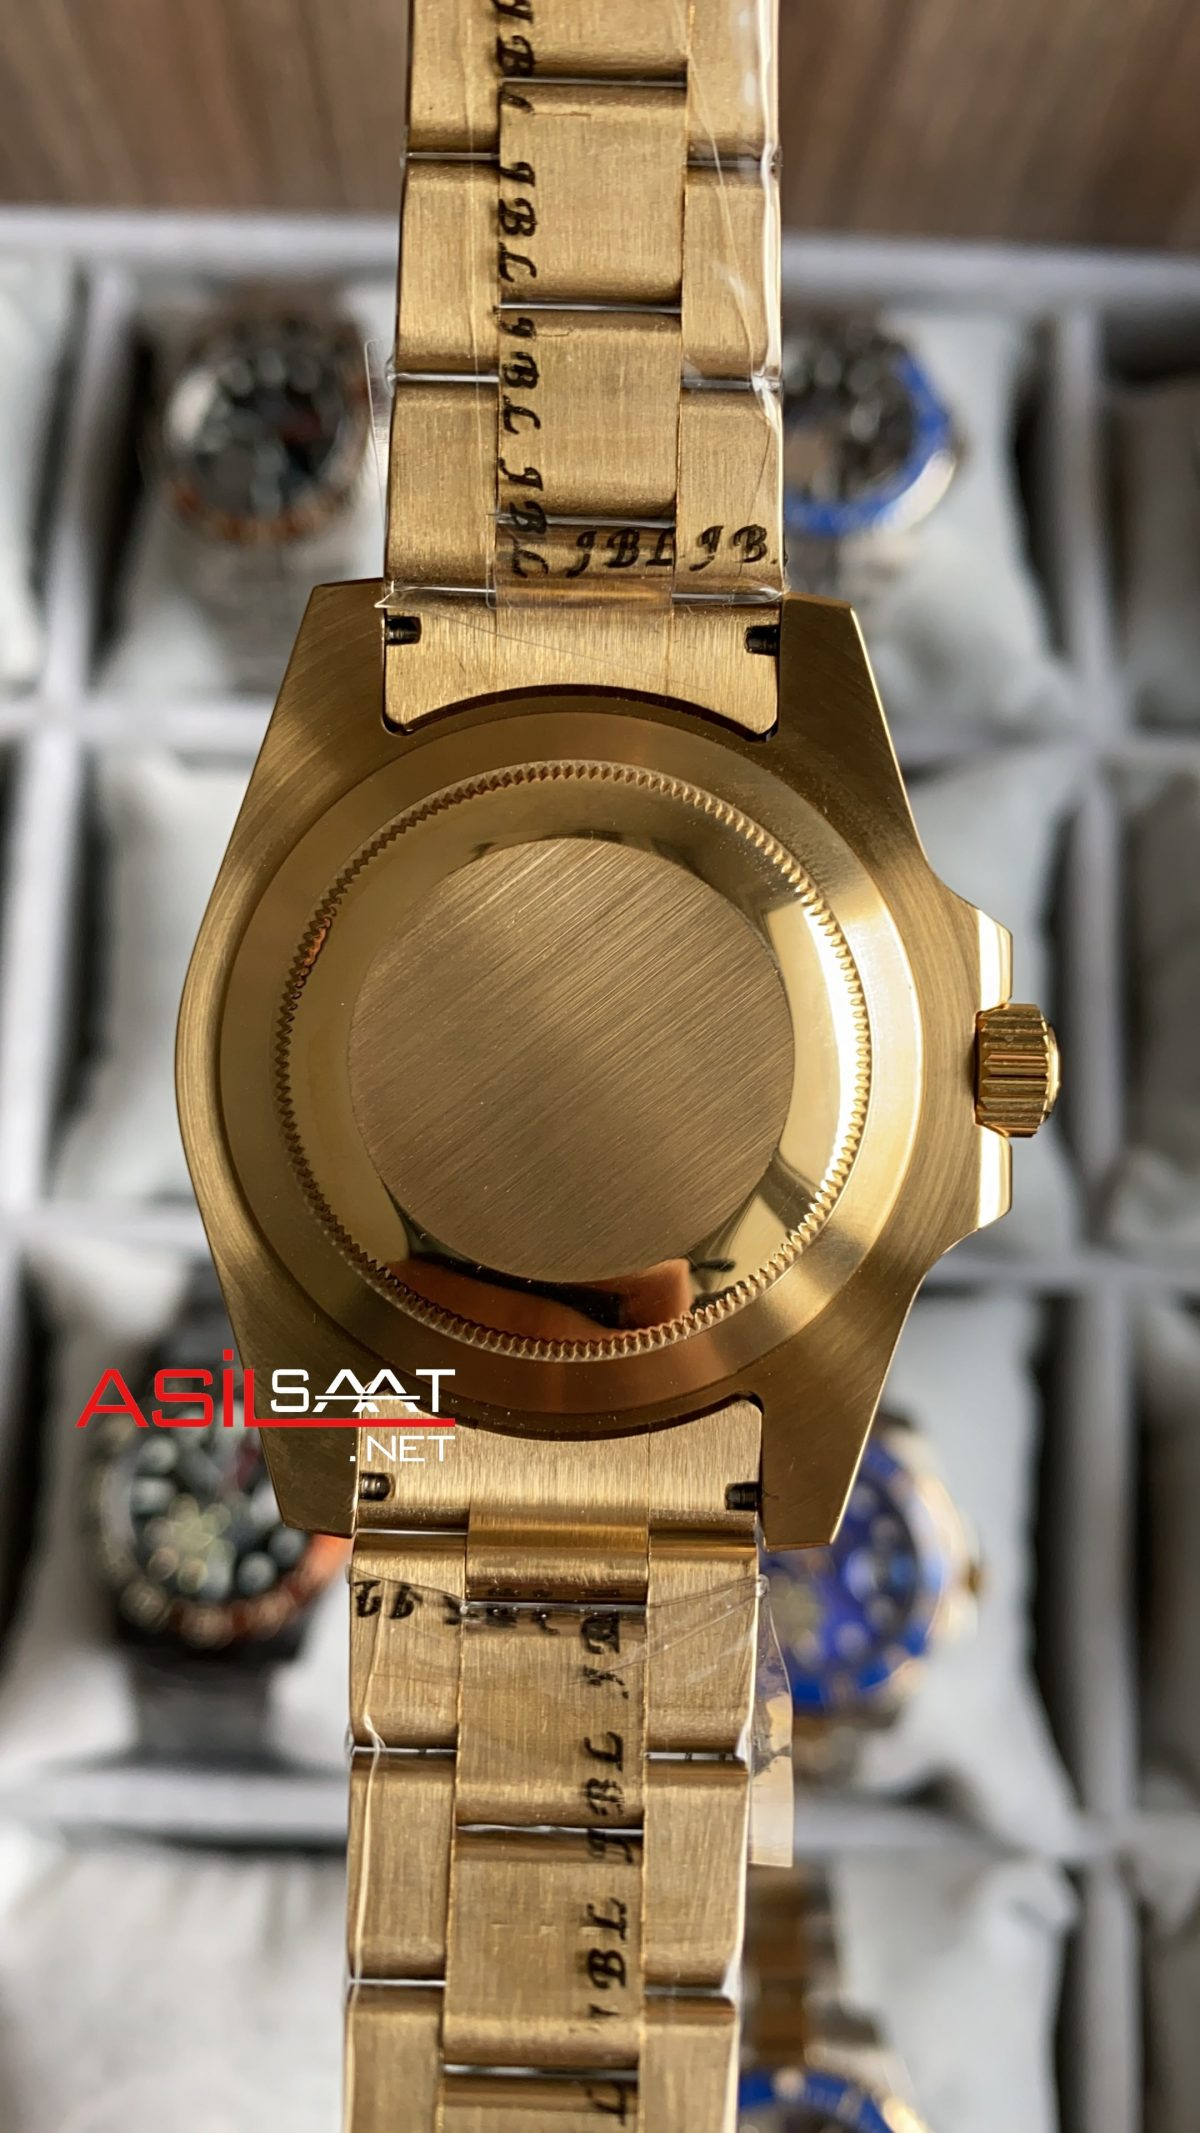 Rolex Submariner Gold 116618 LB ROLS012